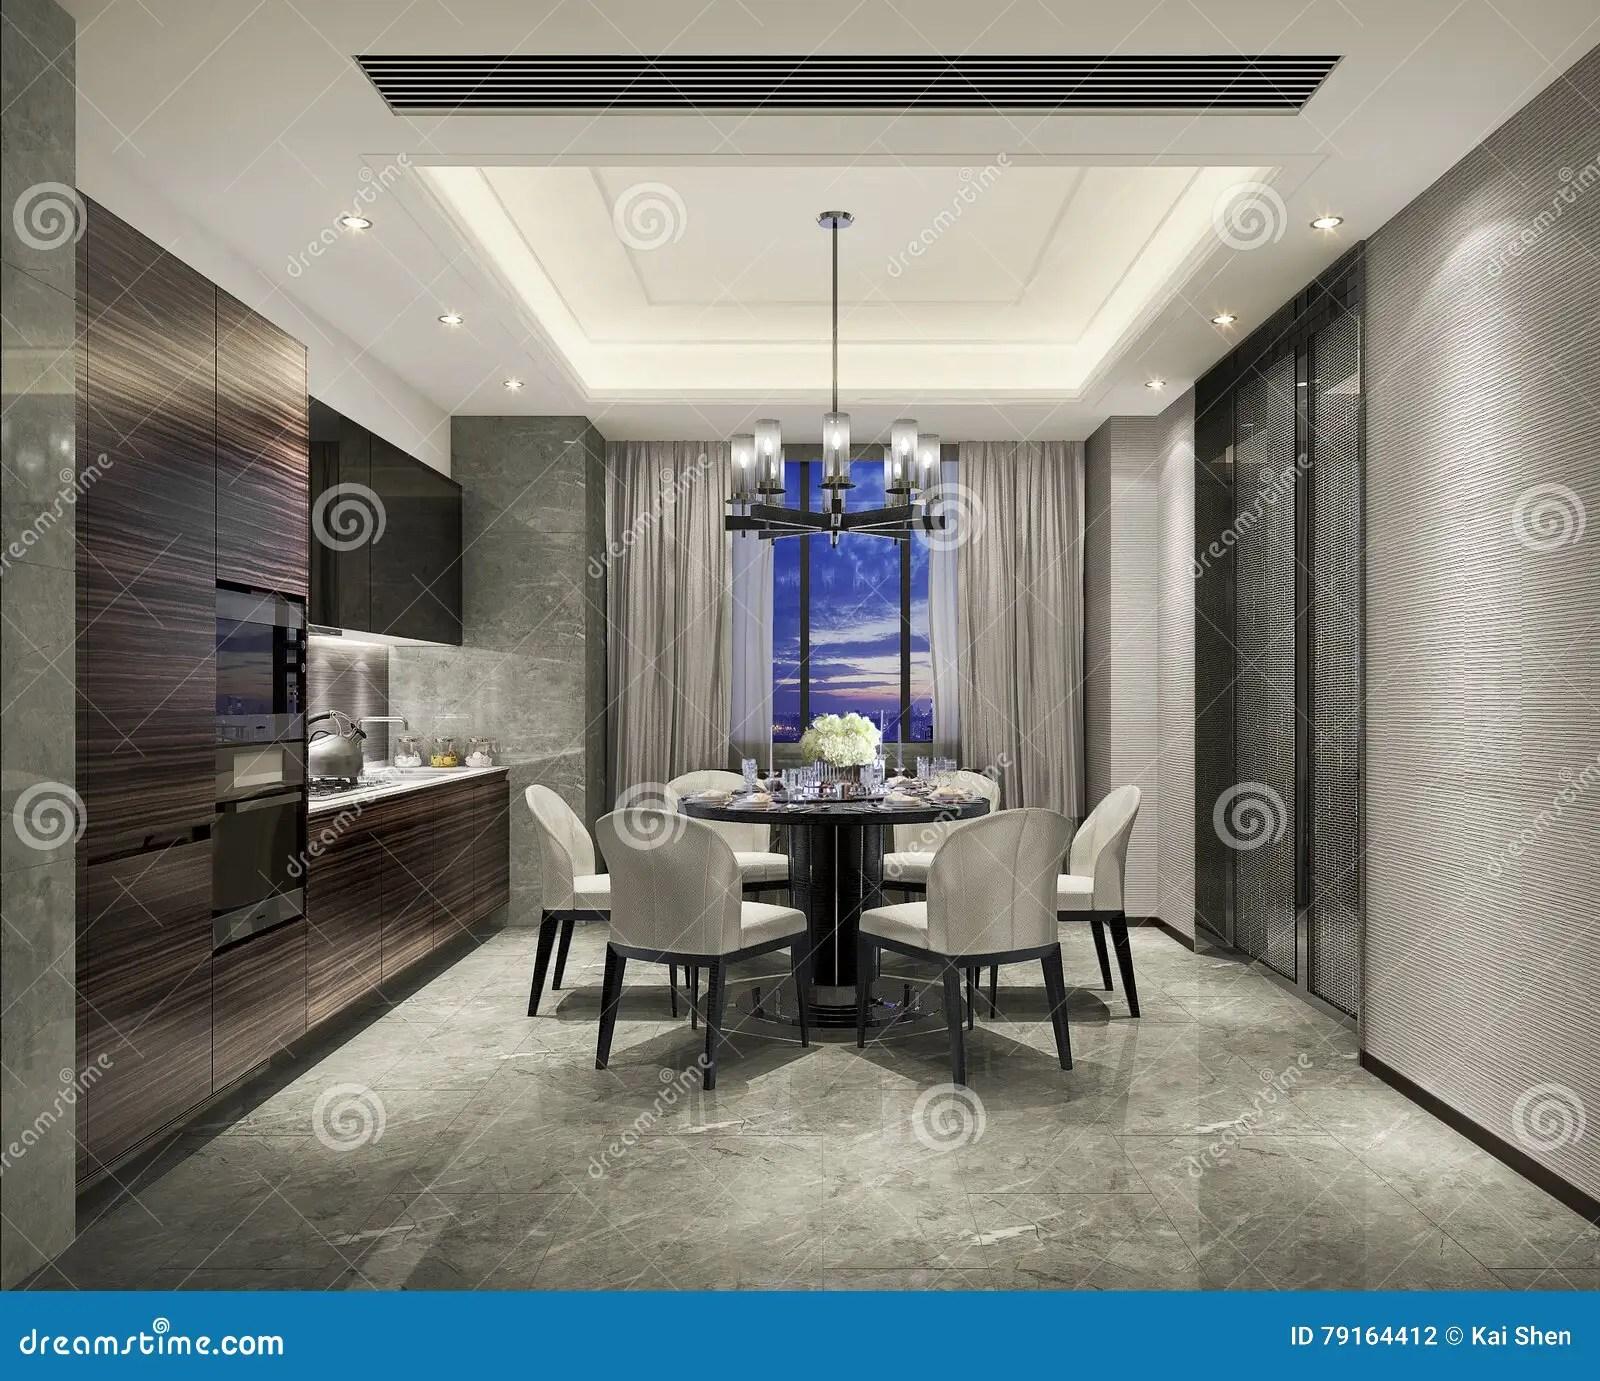 redesigning a kitchen low cost remodel 厨房和饭厅设计一个有组织的整体在上海 高级公寓库存照片 图片包括有 高级公寓